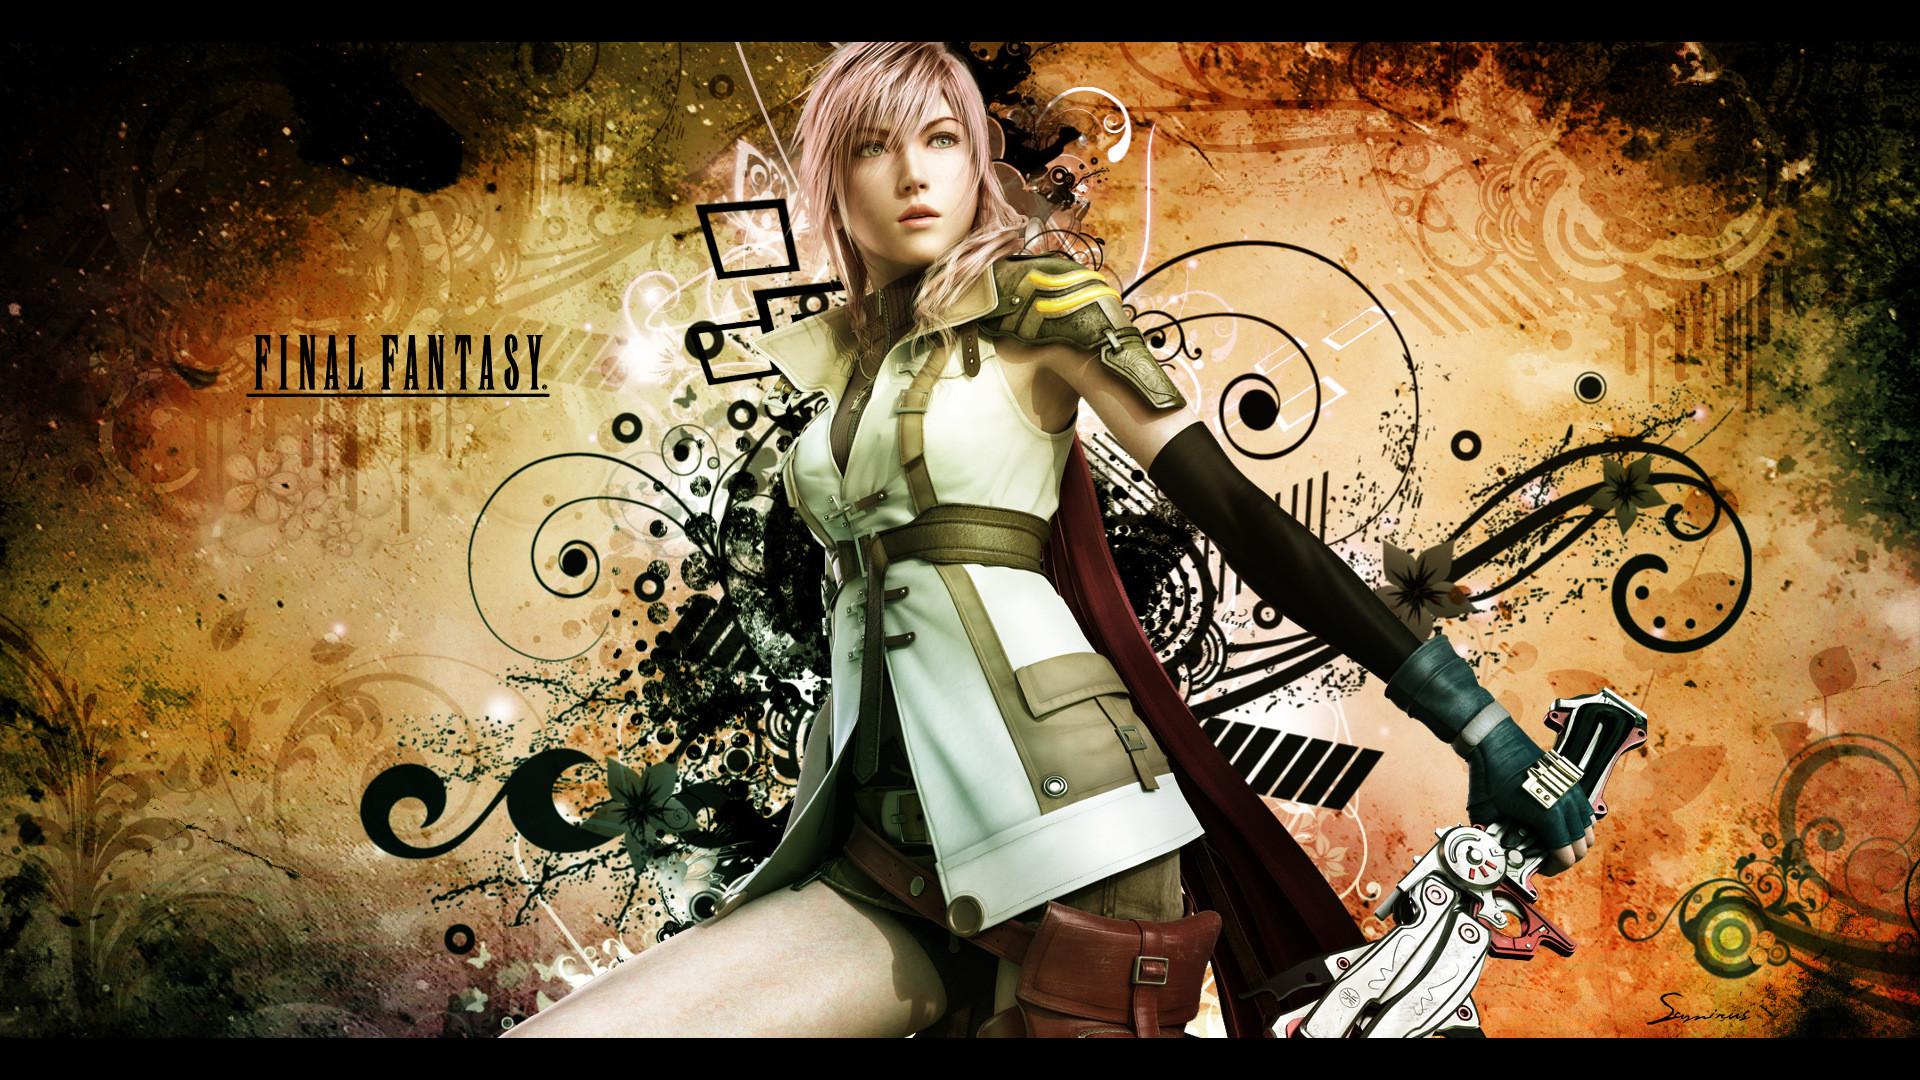 Review: Beautiful, Boring Final Fantasy XIII Loses RPG